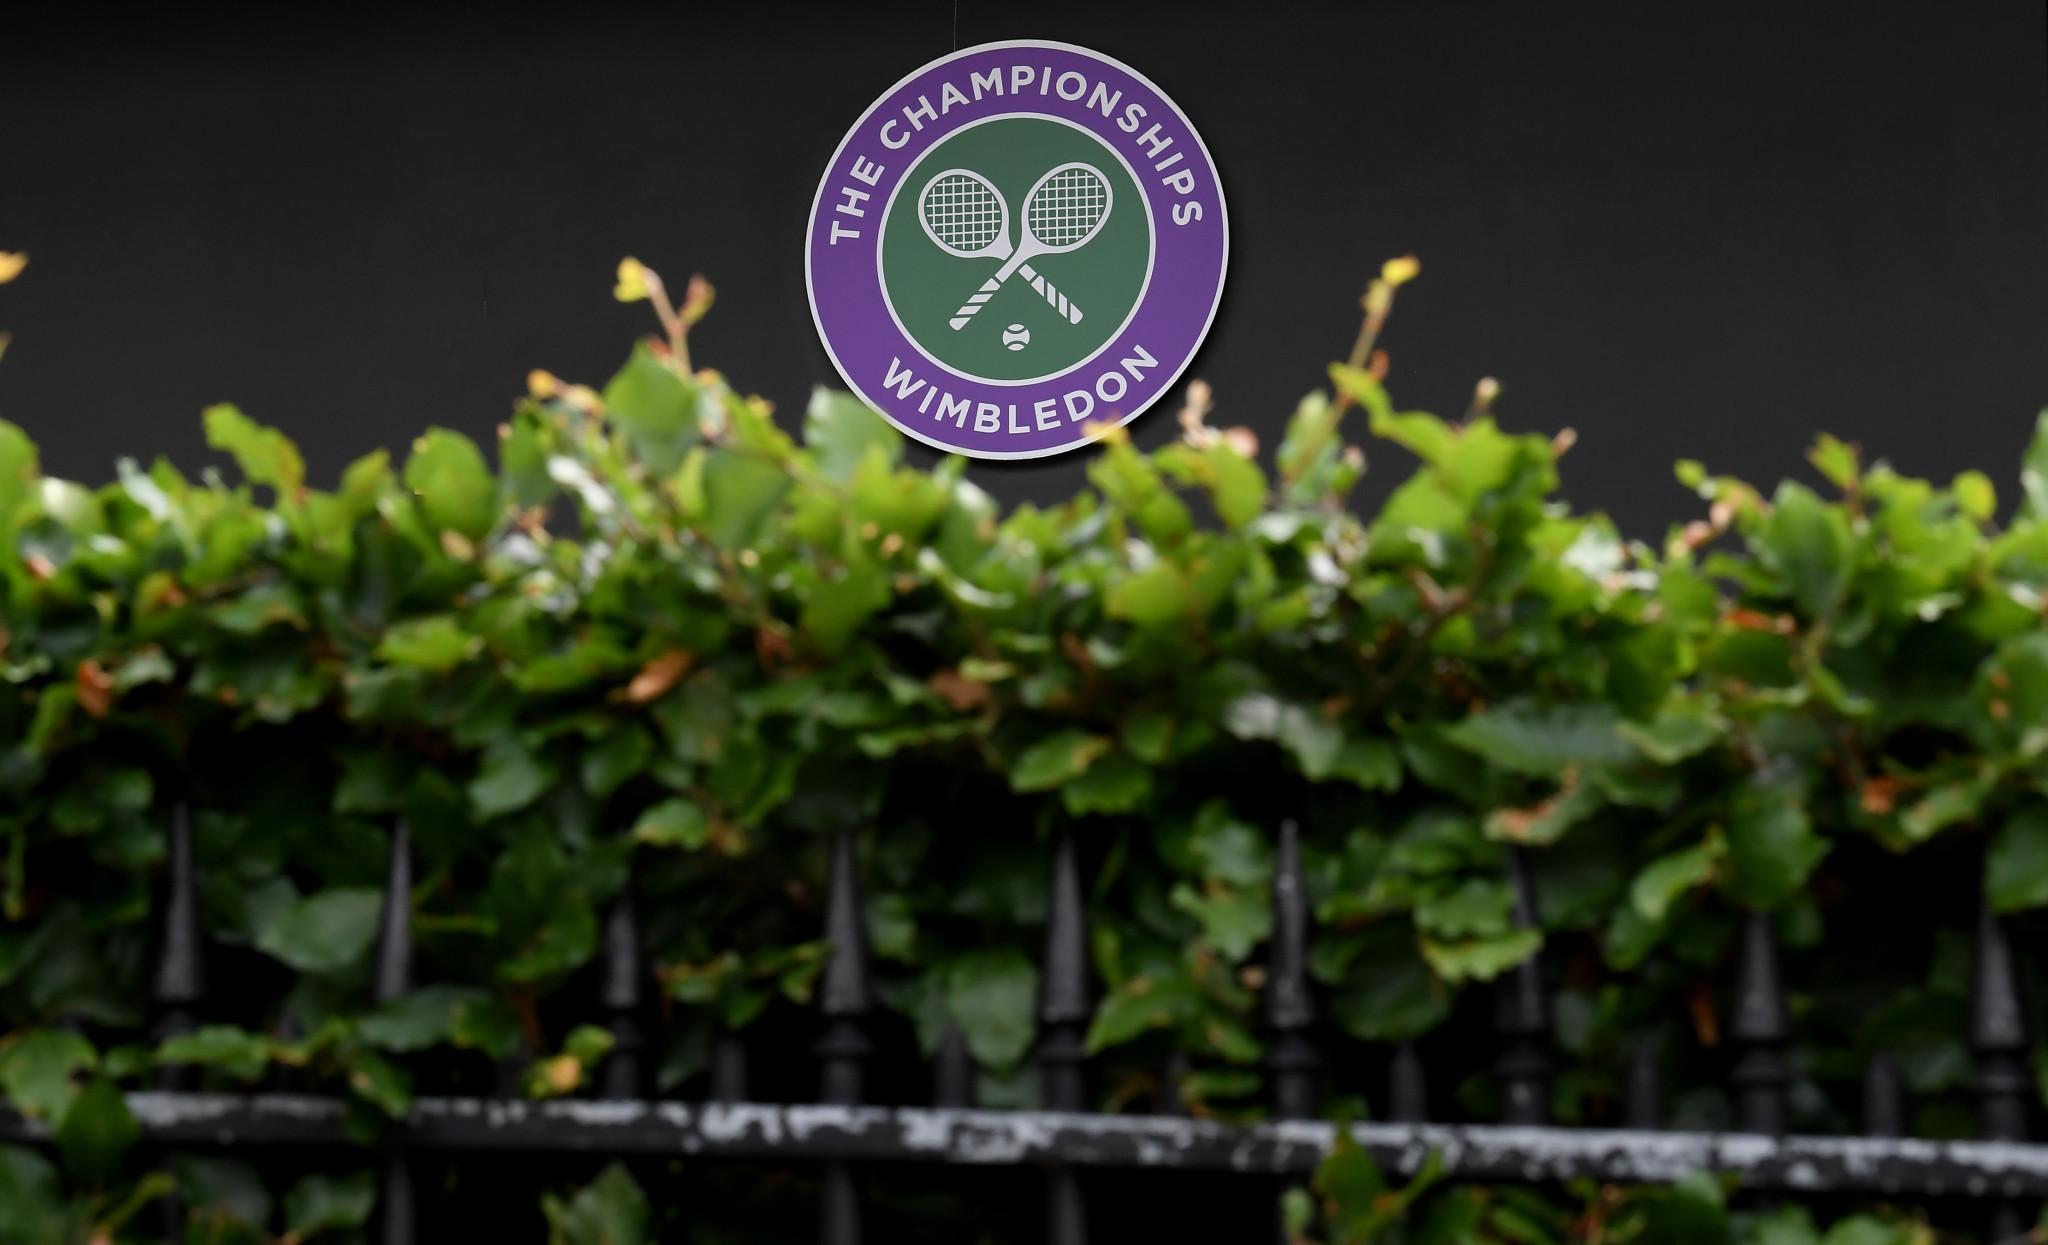 AELTC assessing three scenarios for next year's Wimbledon